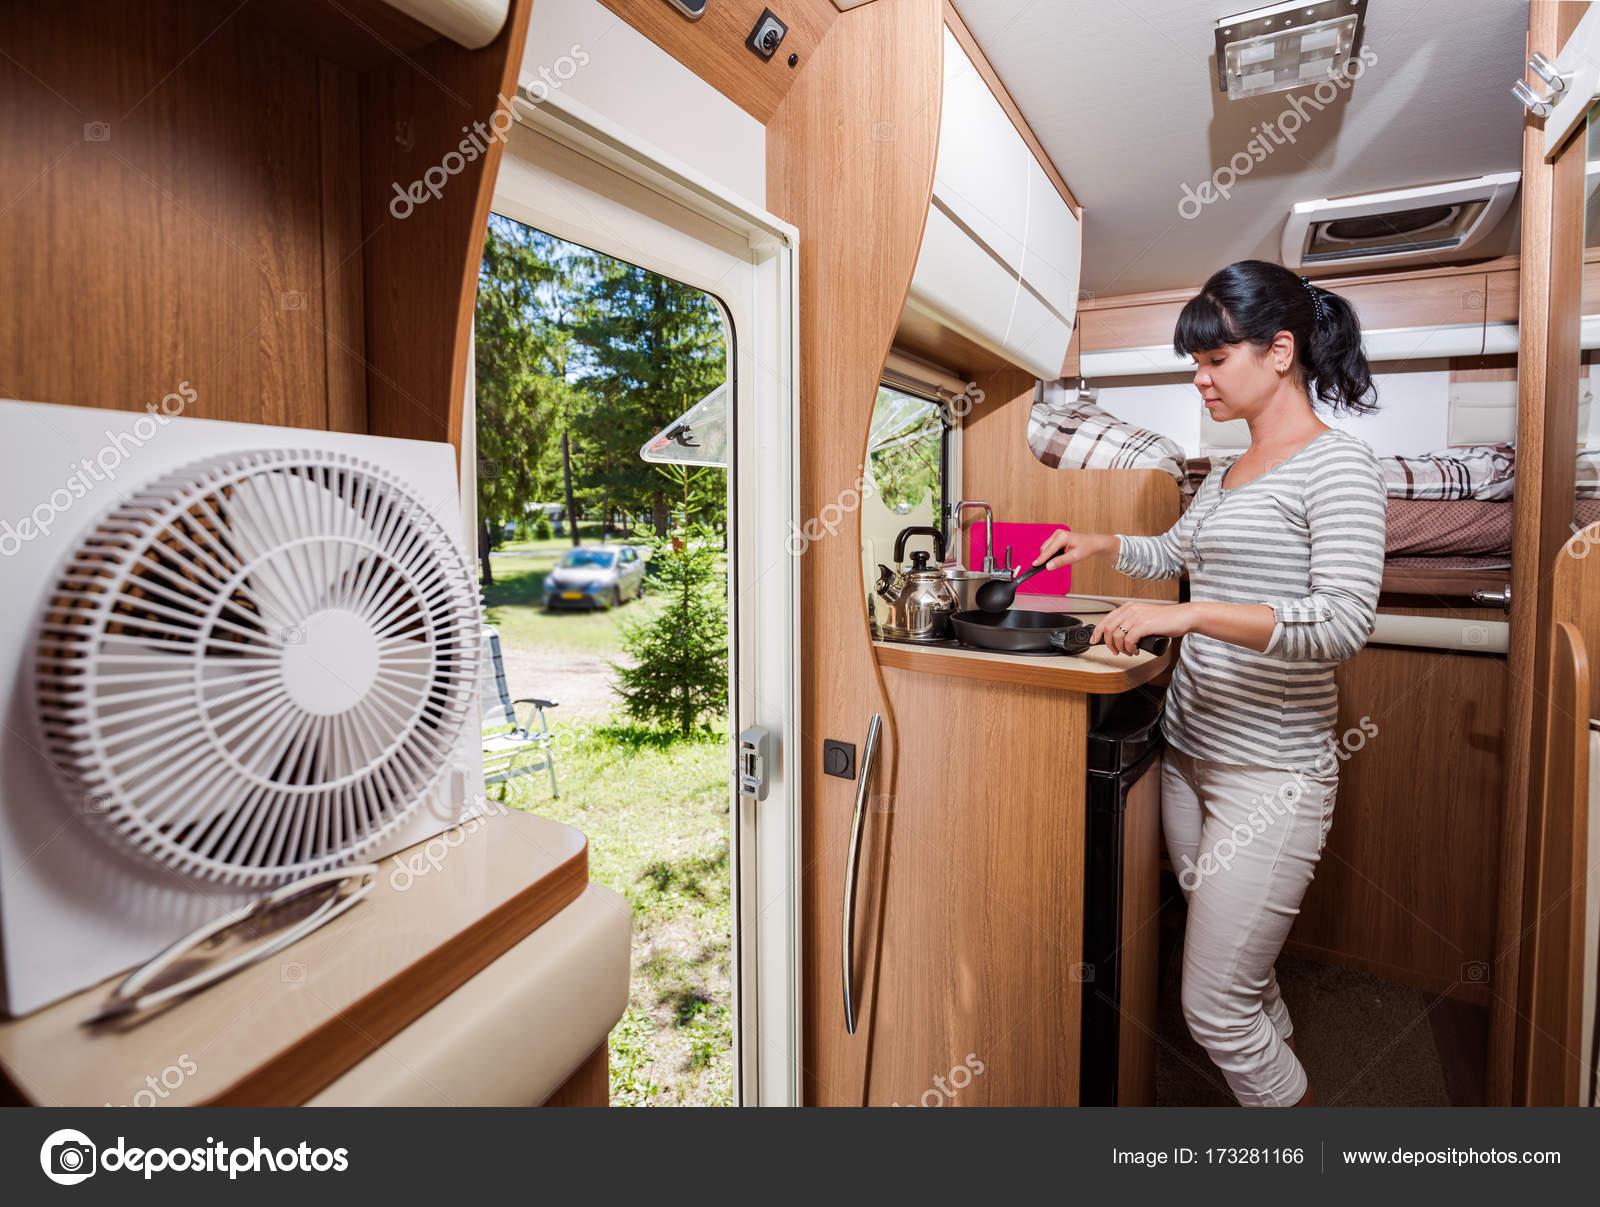 Frau, Kochen im Wohnmobil, Wohnmobil Rv Interieur — Stockfoto ...